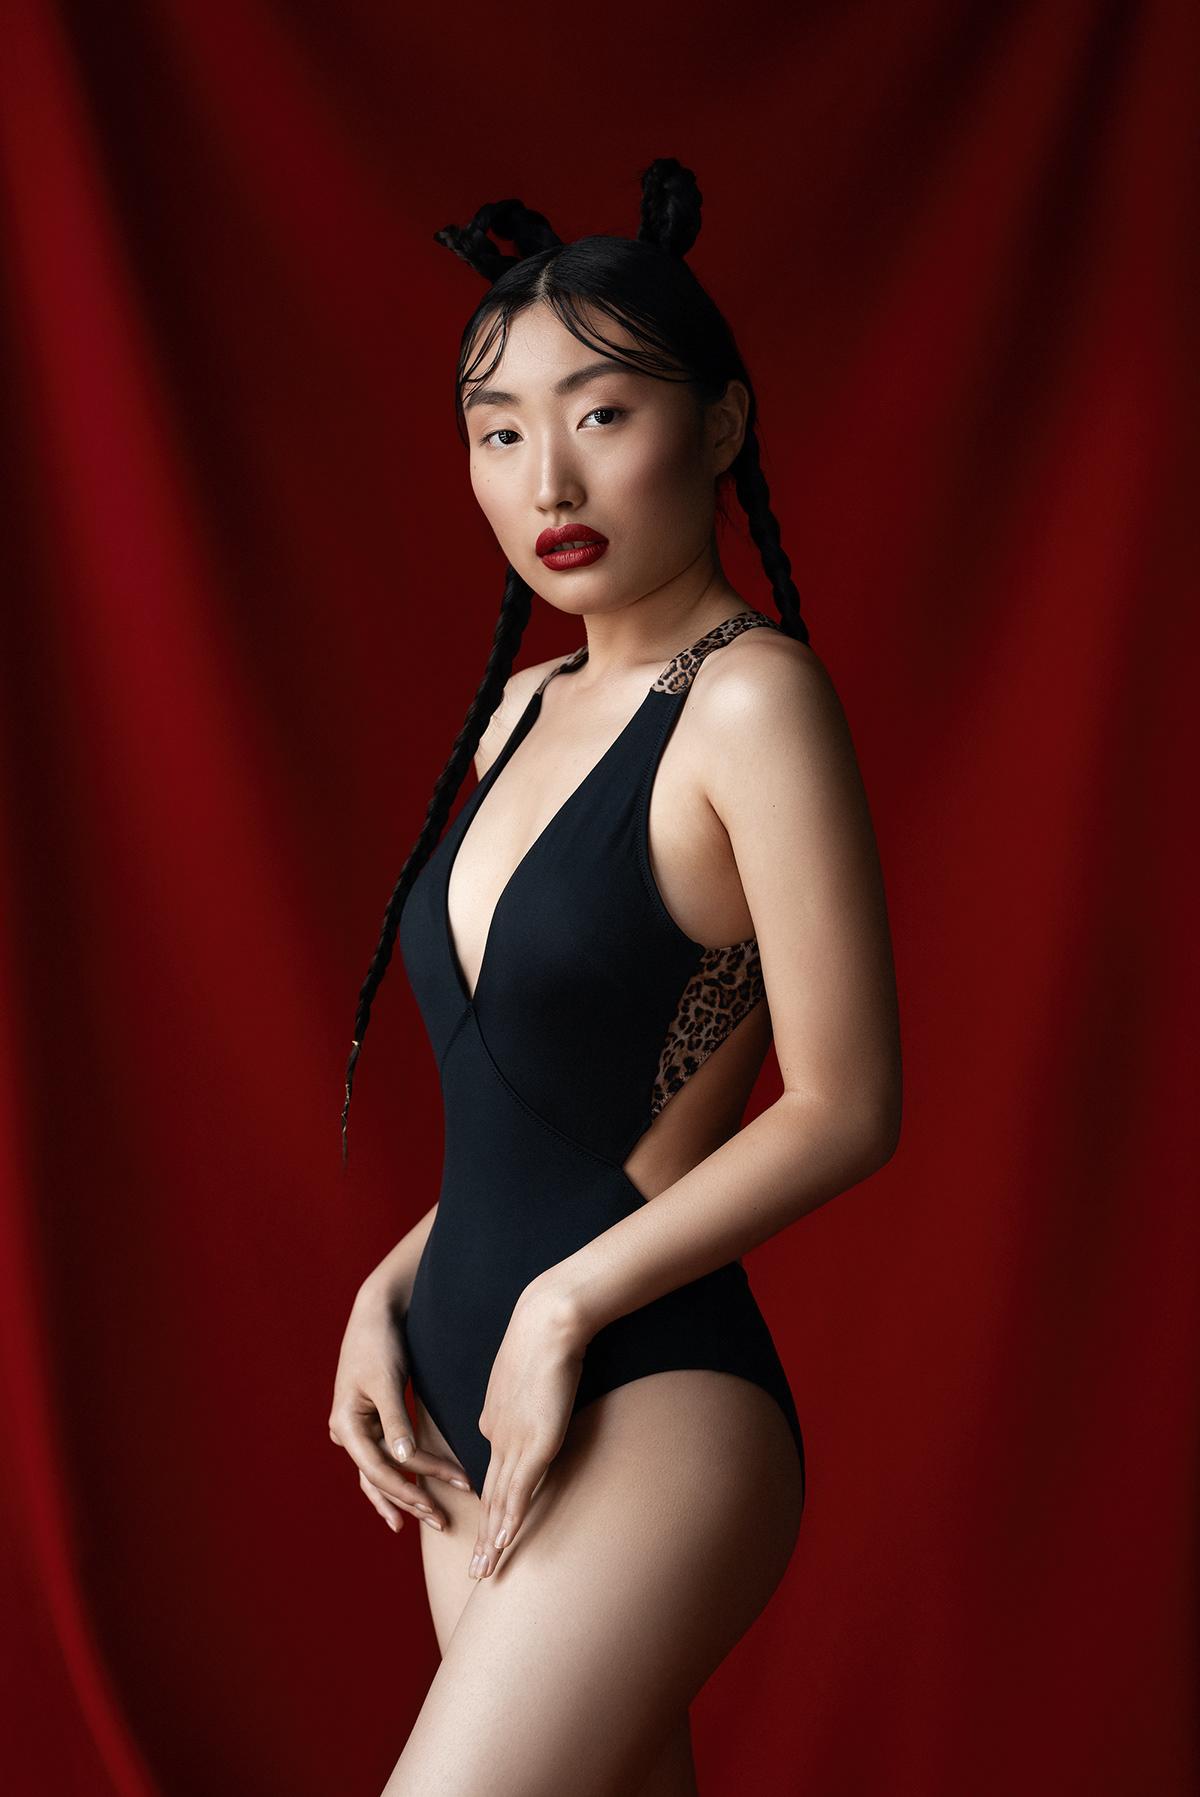 Red Elegance / фотограф Eugene Li